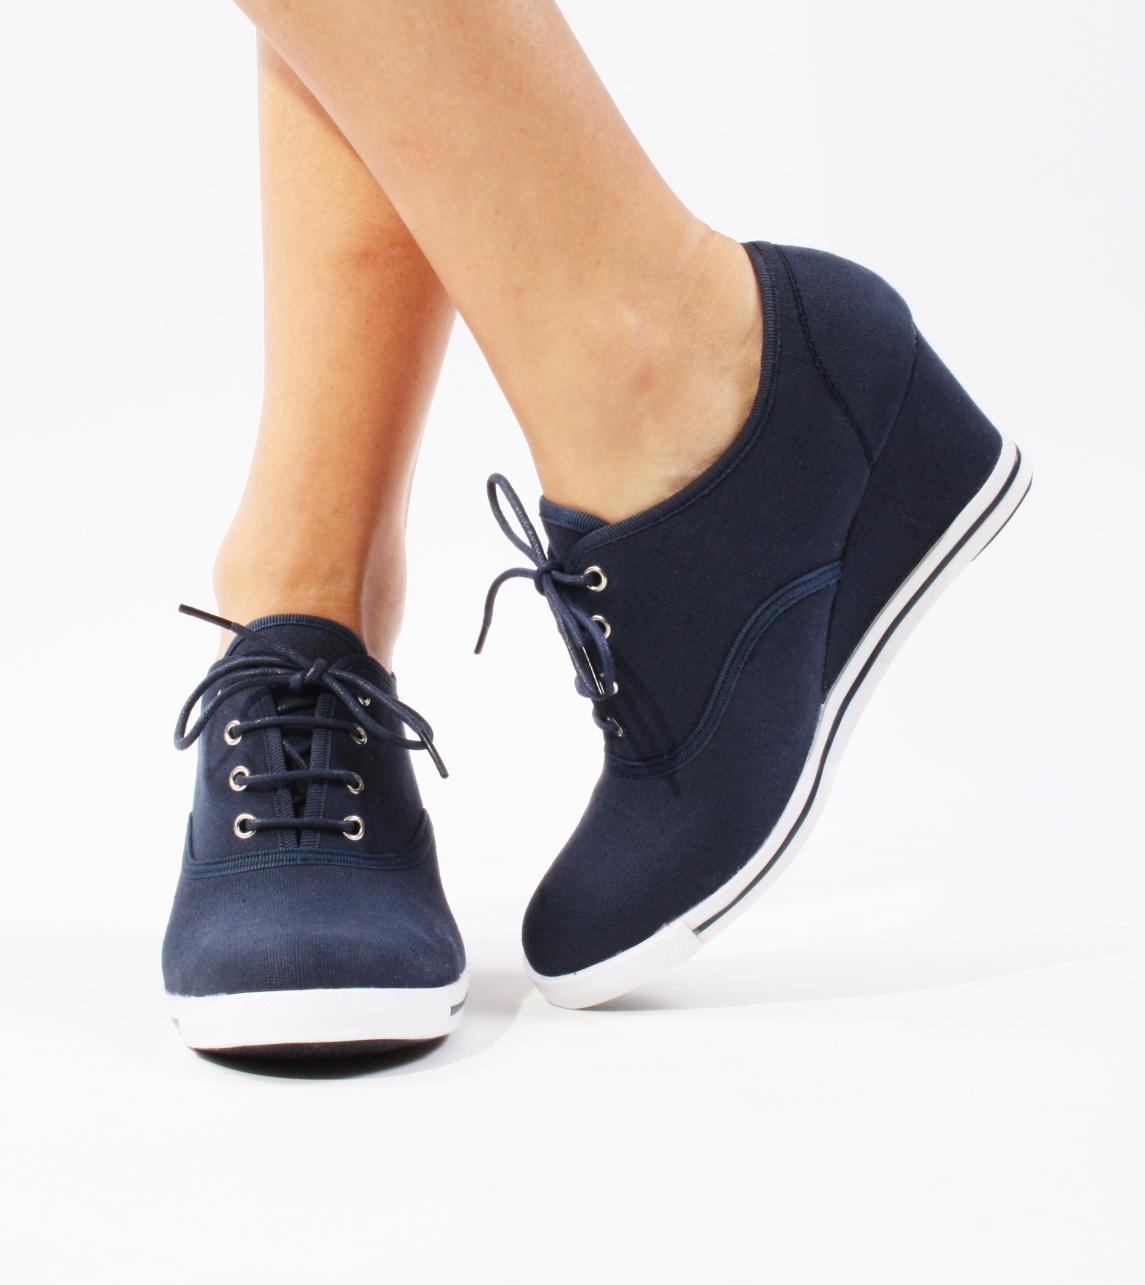 damen damenschuhe jumex wedges keilabsatz sneakers schuhe. Black Bedroom Furniture Sets. Home Design Ideas